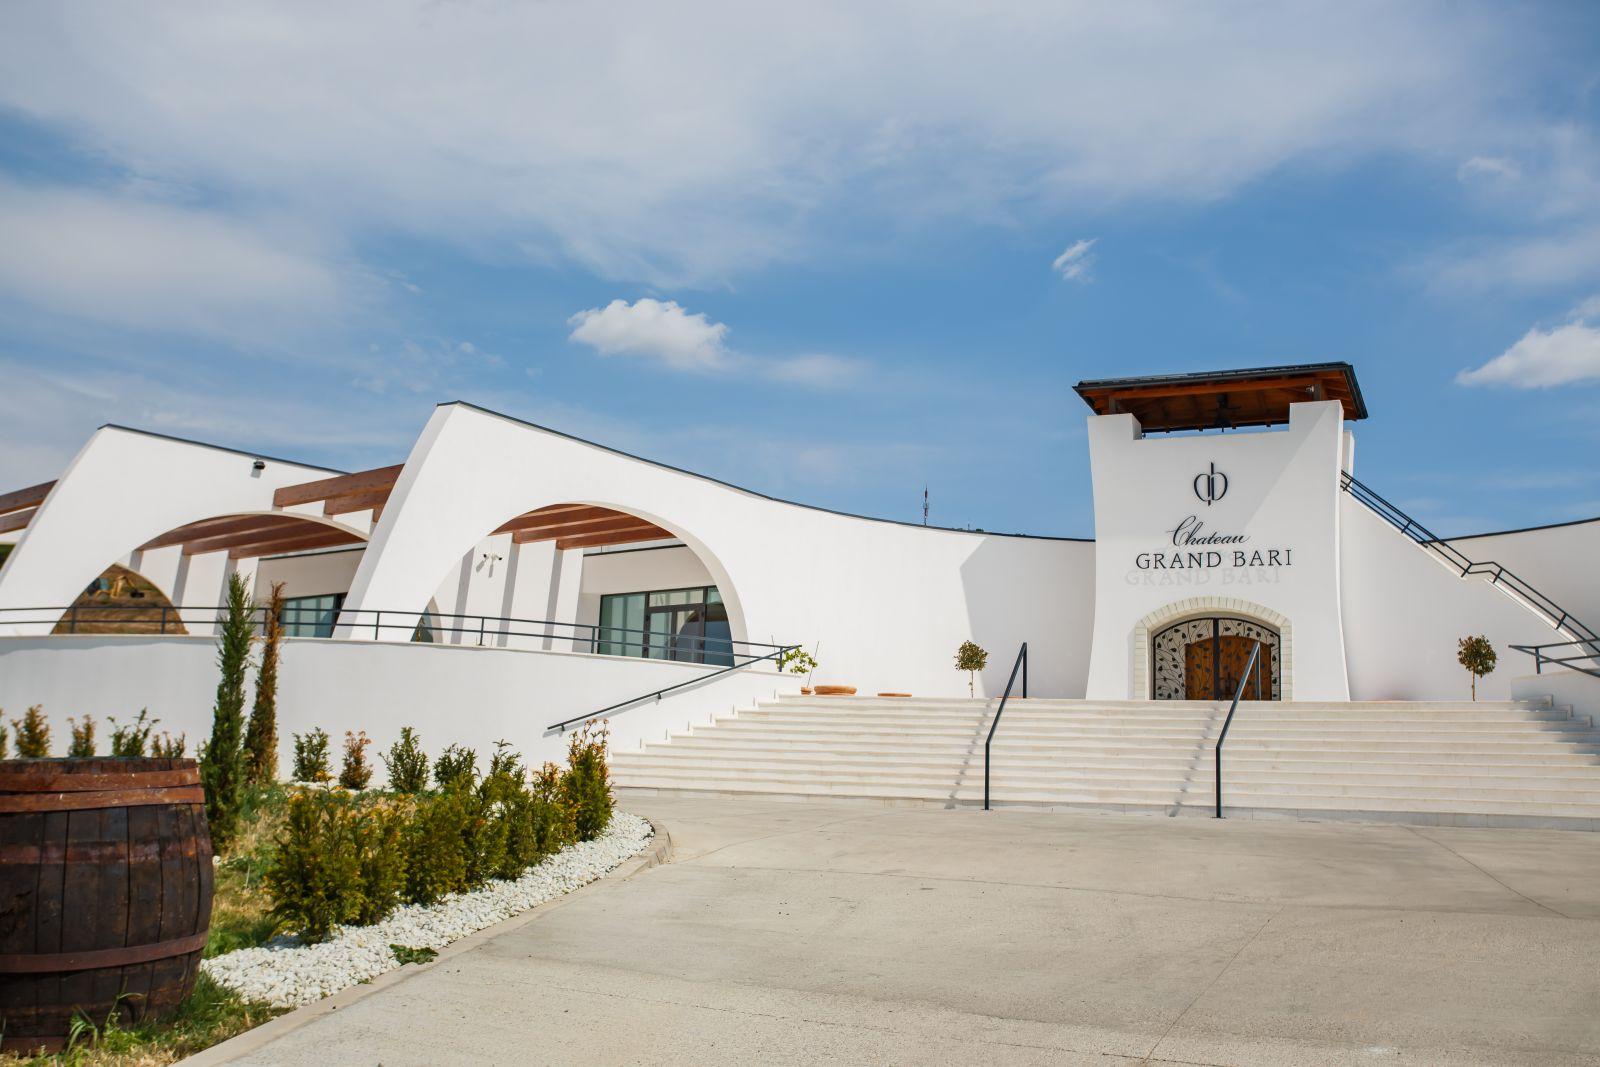 Vinarstvo Grand Bari